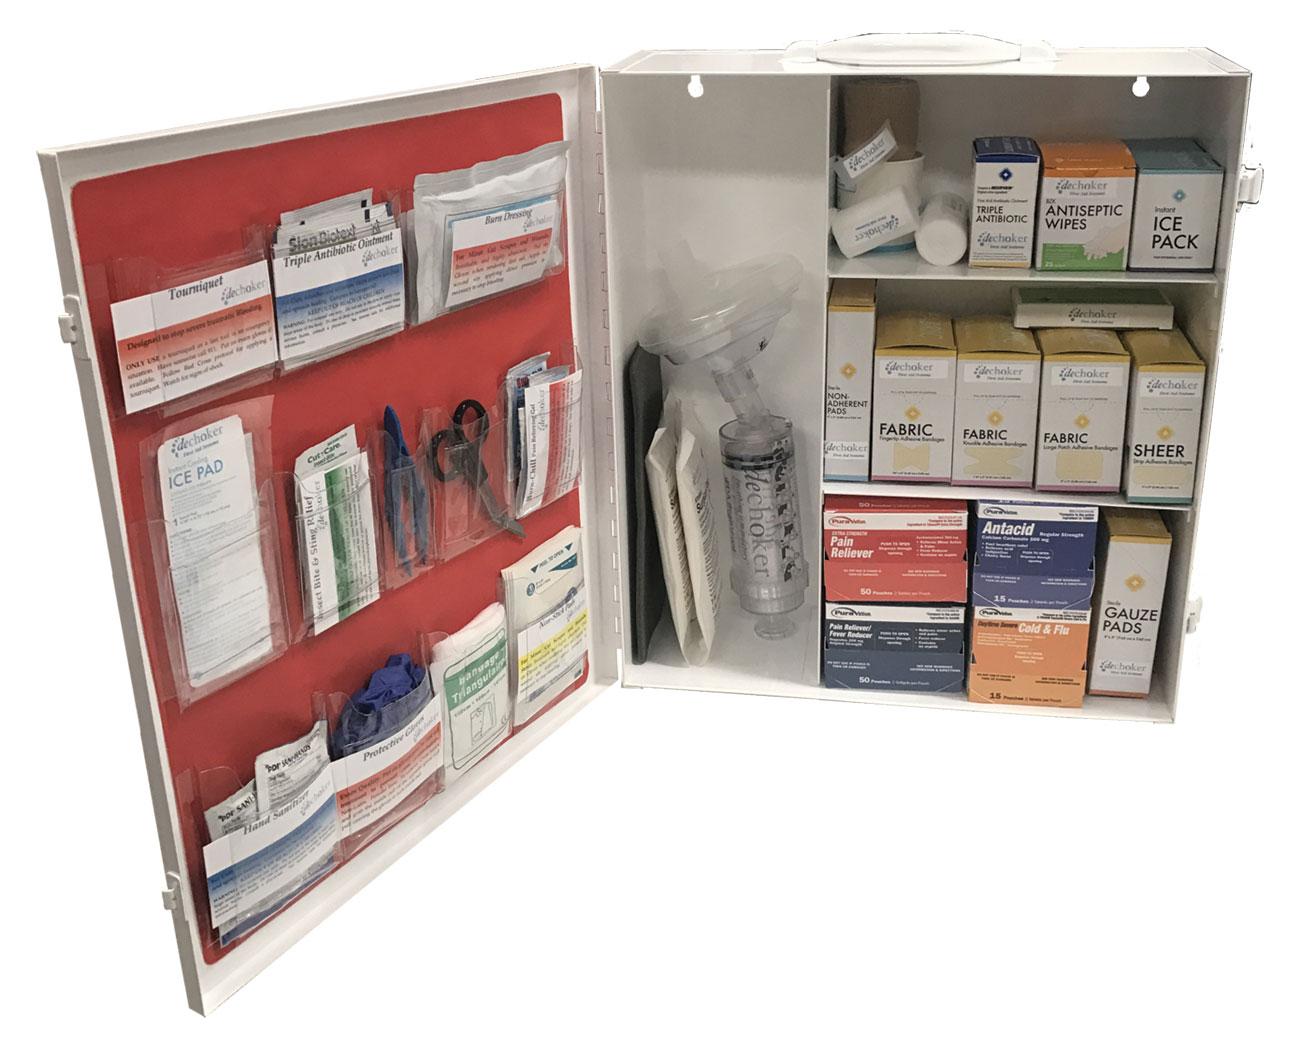 Dechoker Restaurant and Food Service First Aid + Choking Aid Kit